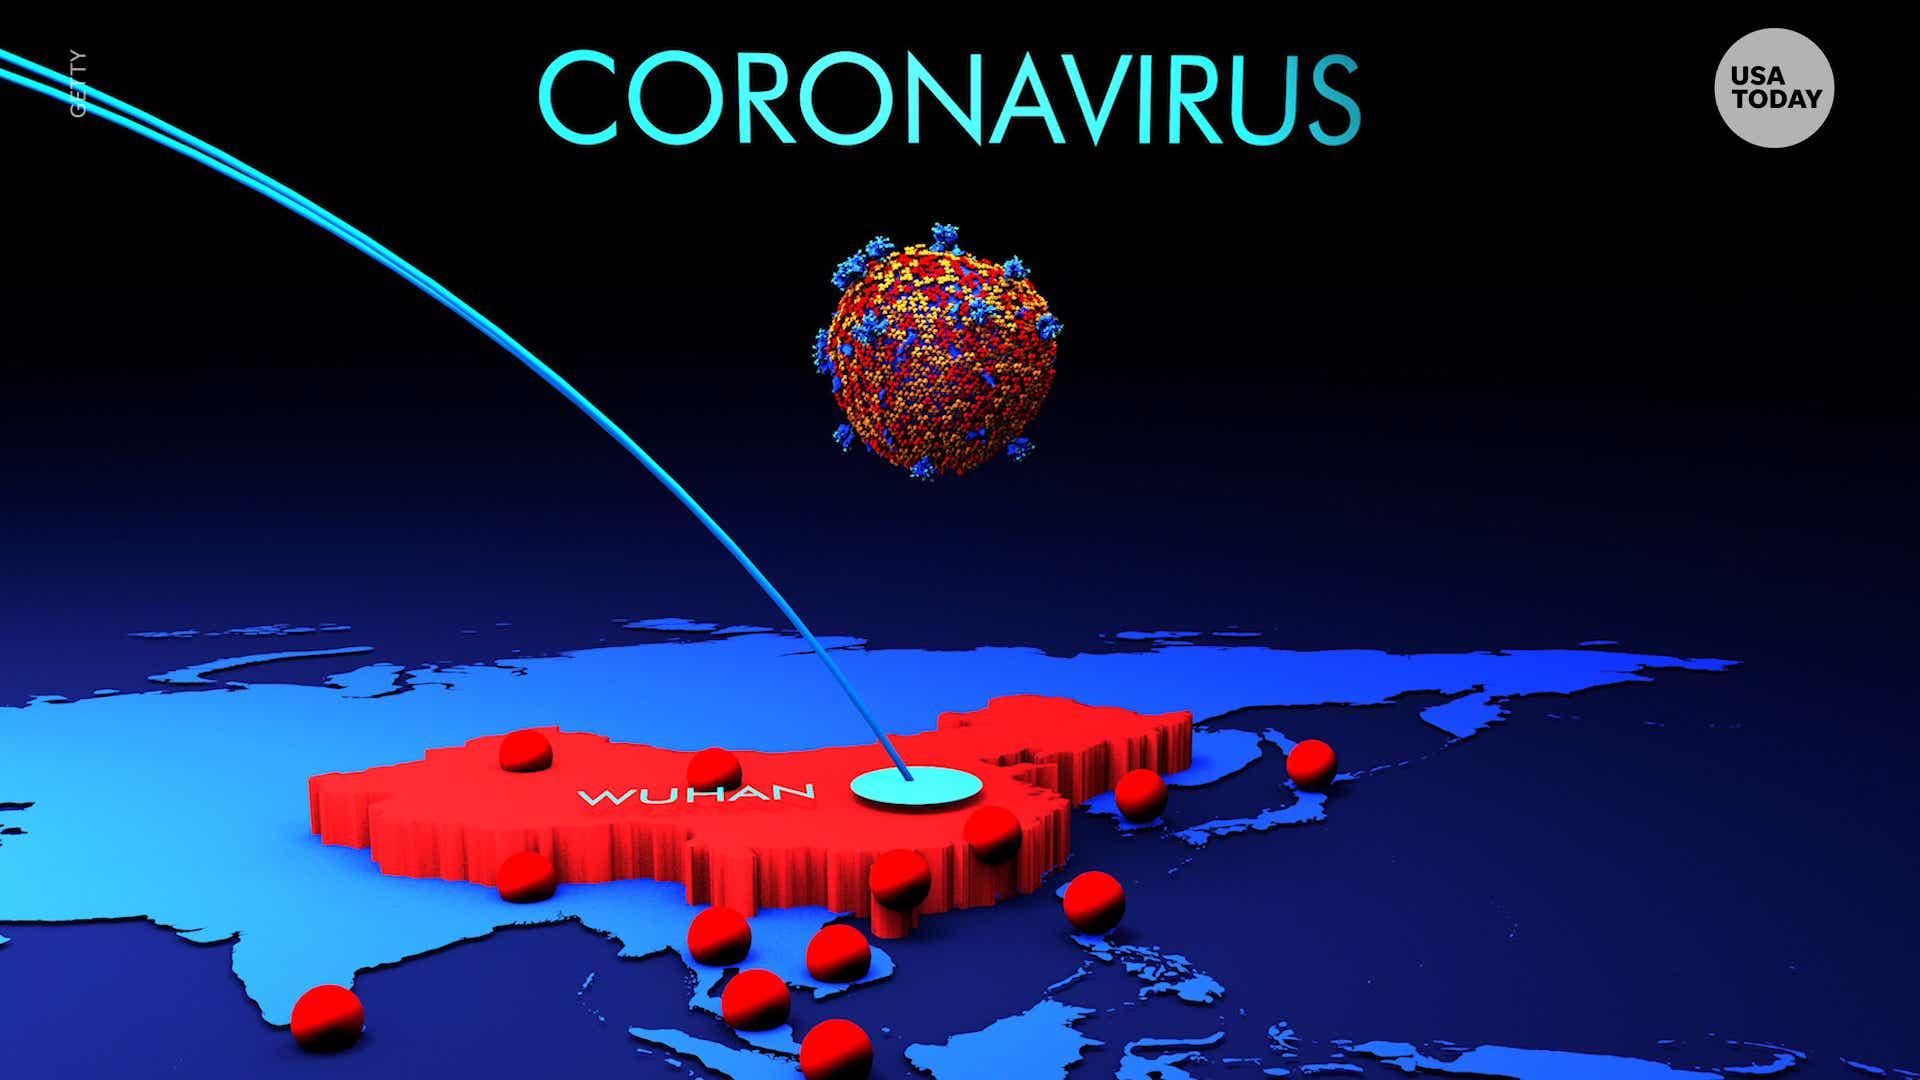 San Francisco Asylum Office work during corona-virus time